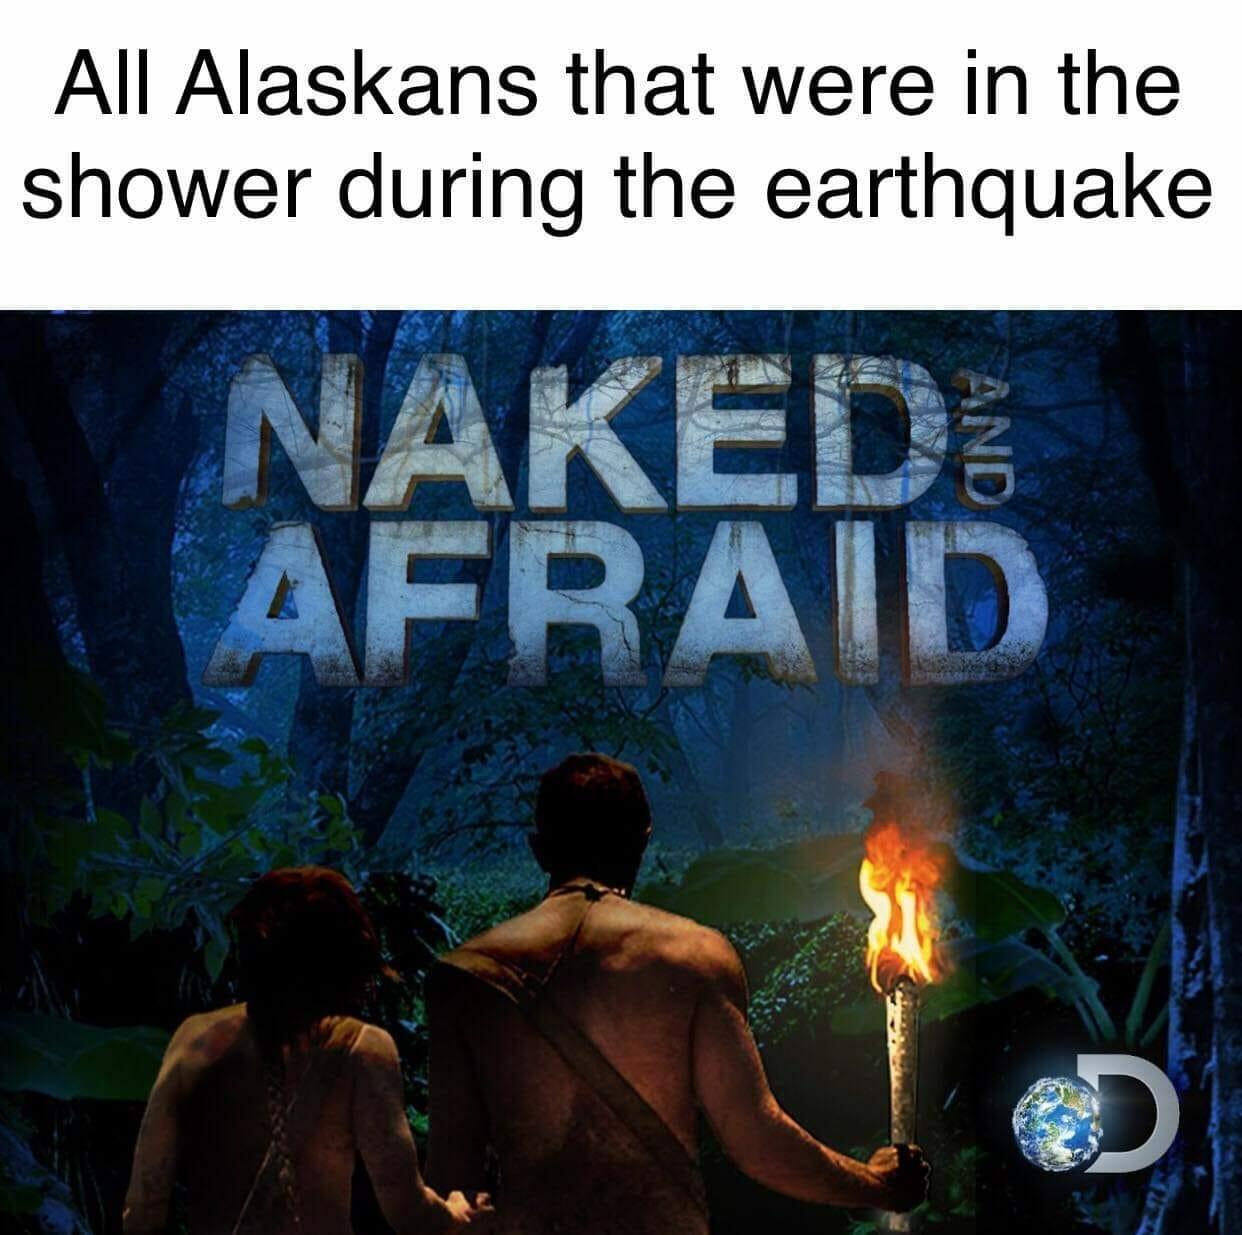 Anchorage Earthquake Memes -7114